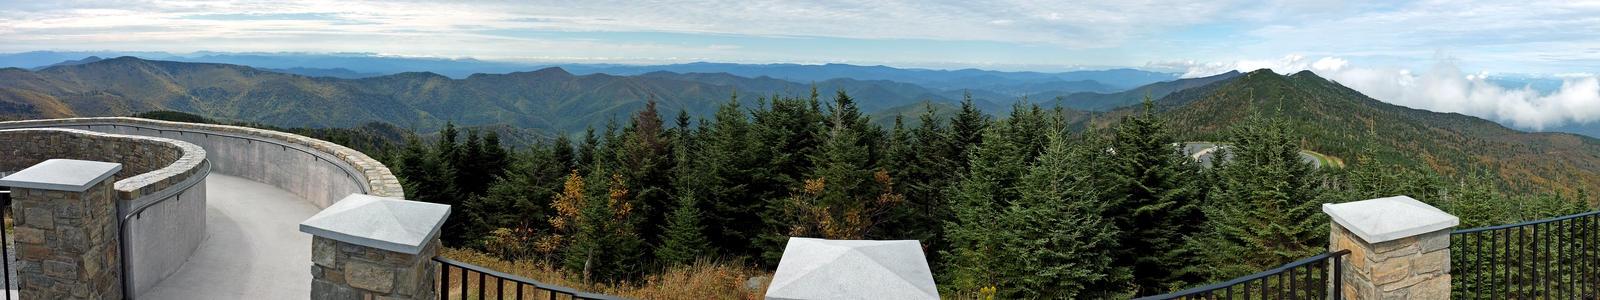 Mt. Mitchell Summit Panorama 5